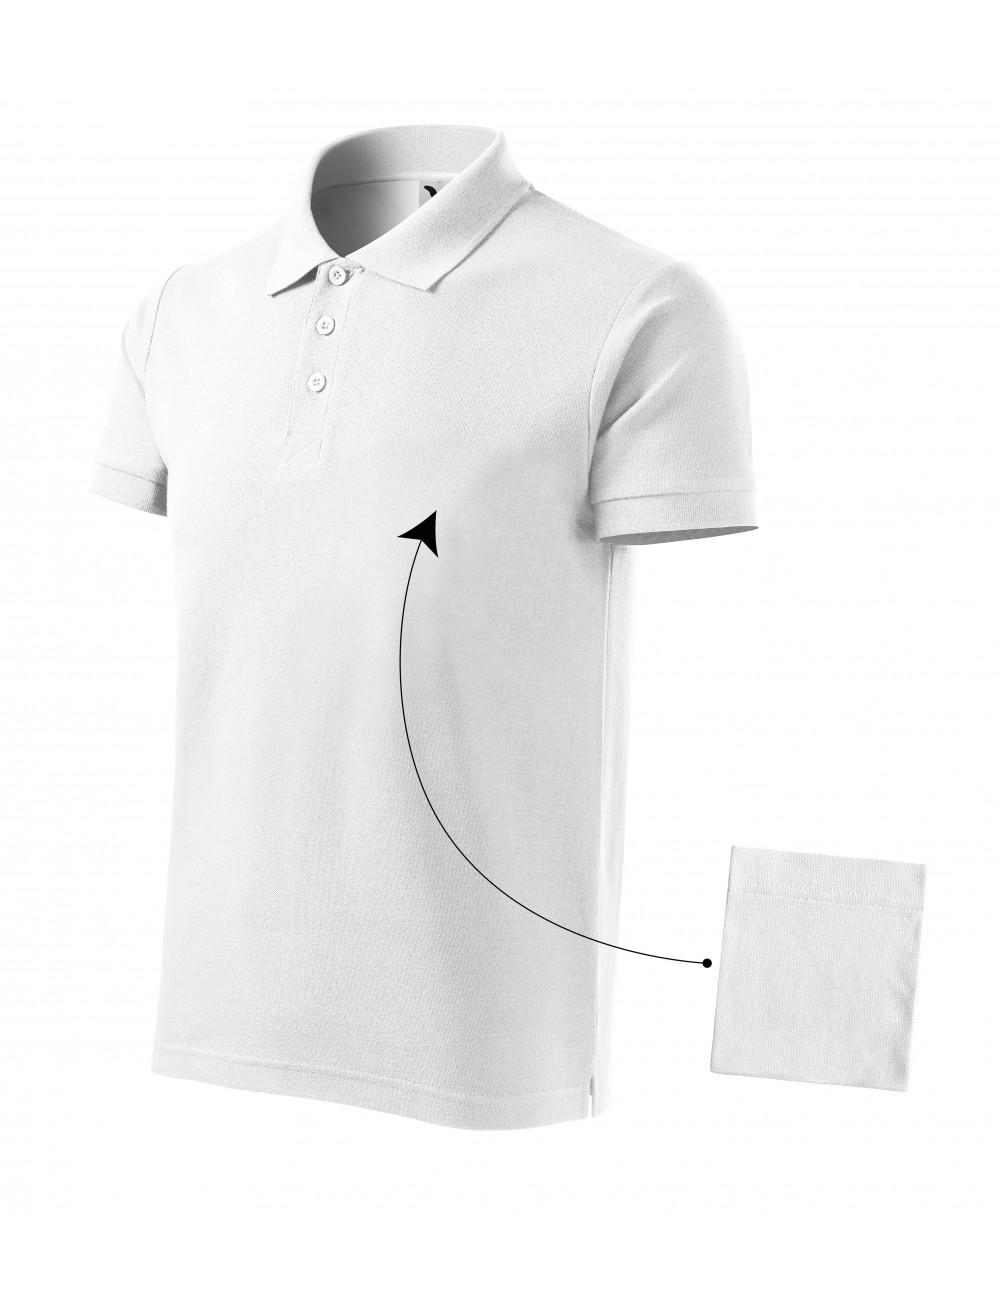 Adler MALFINI Koszulka polo męska Cotton 212 biały